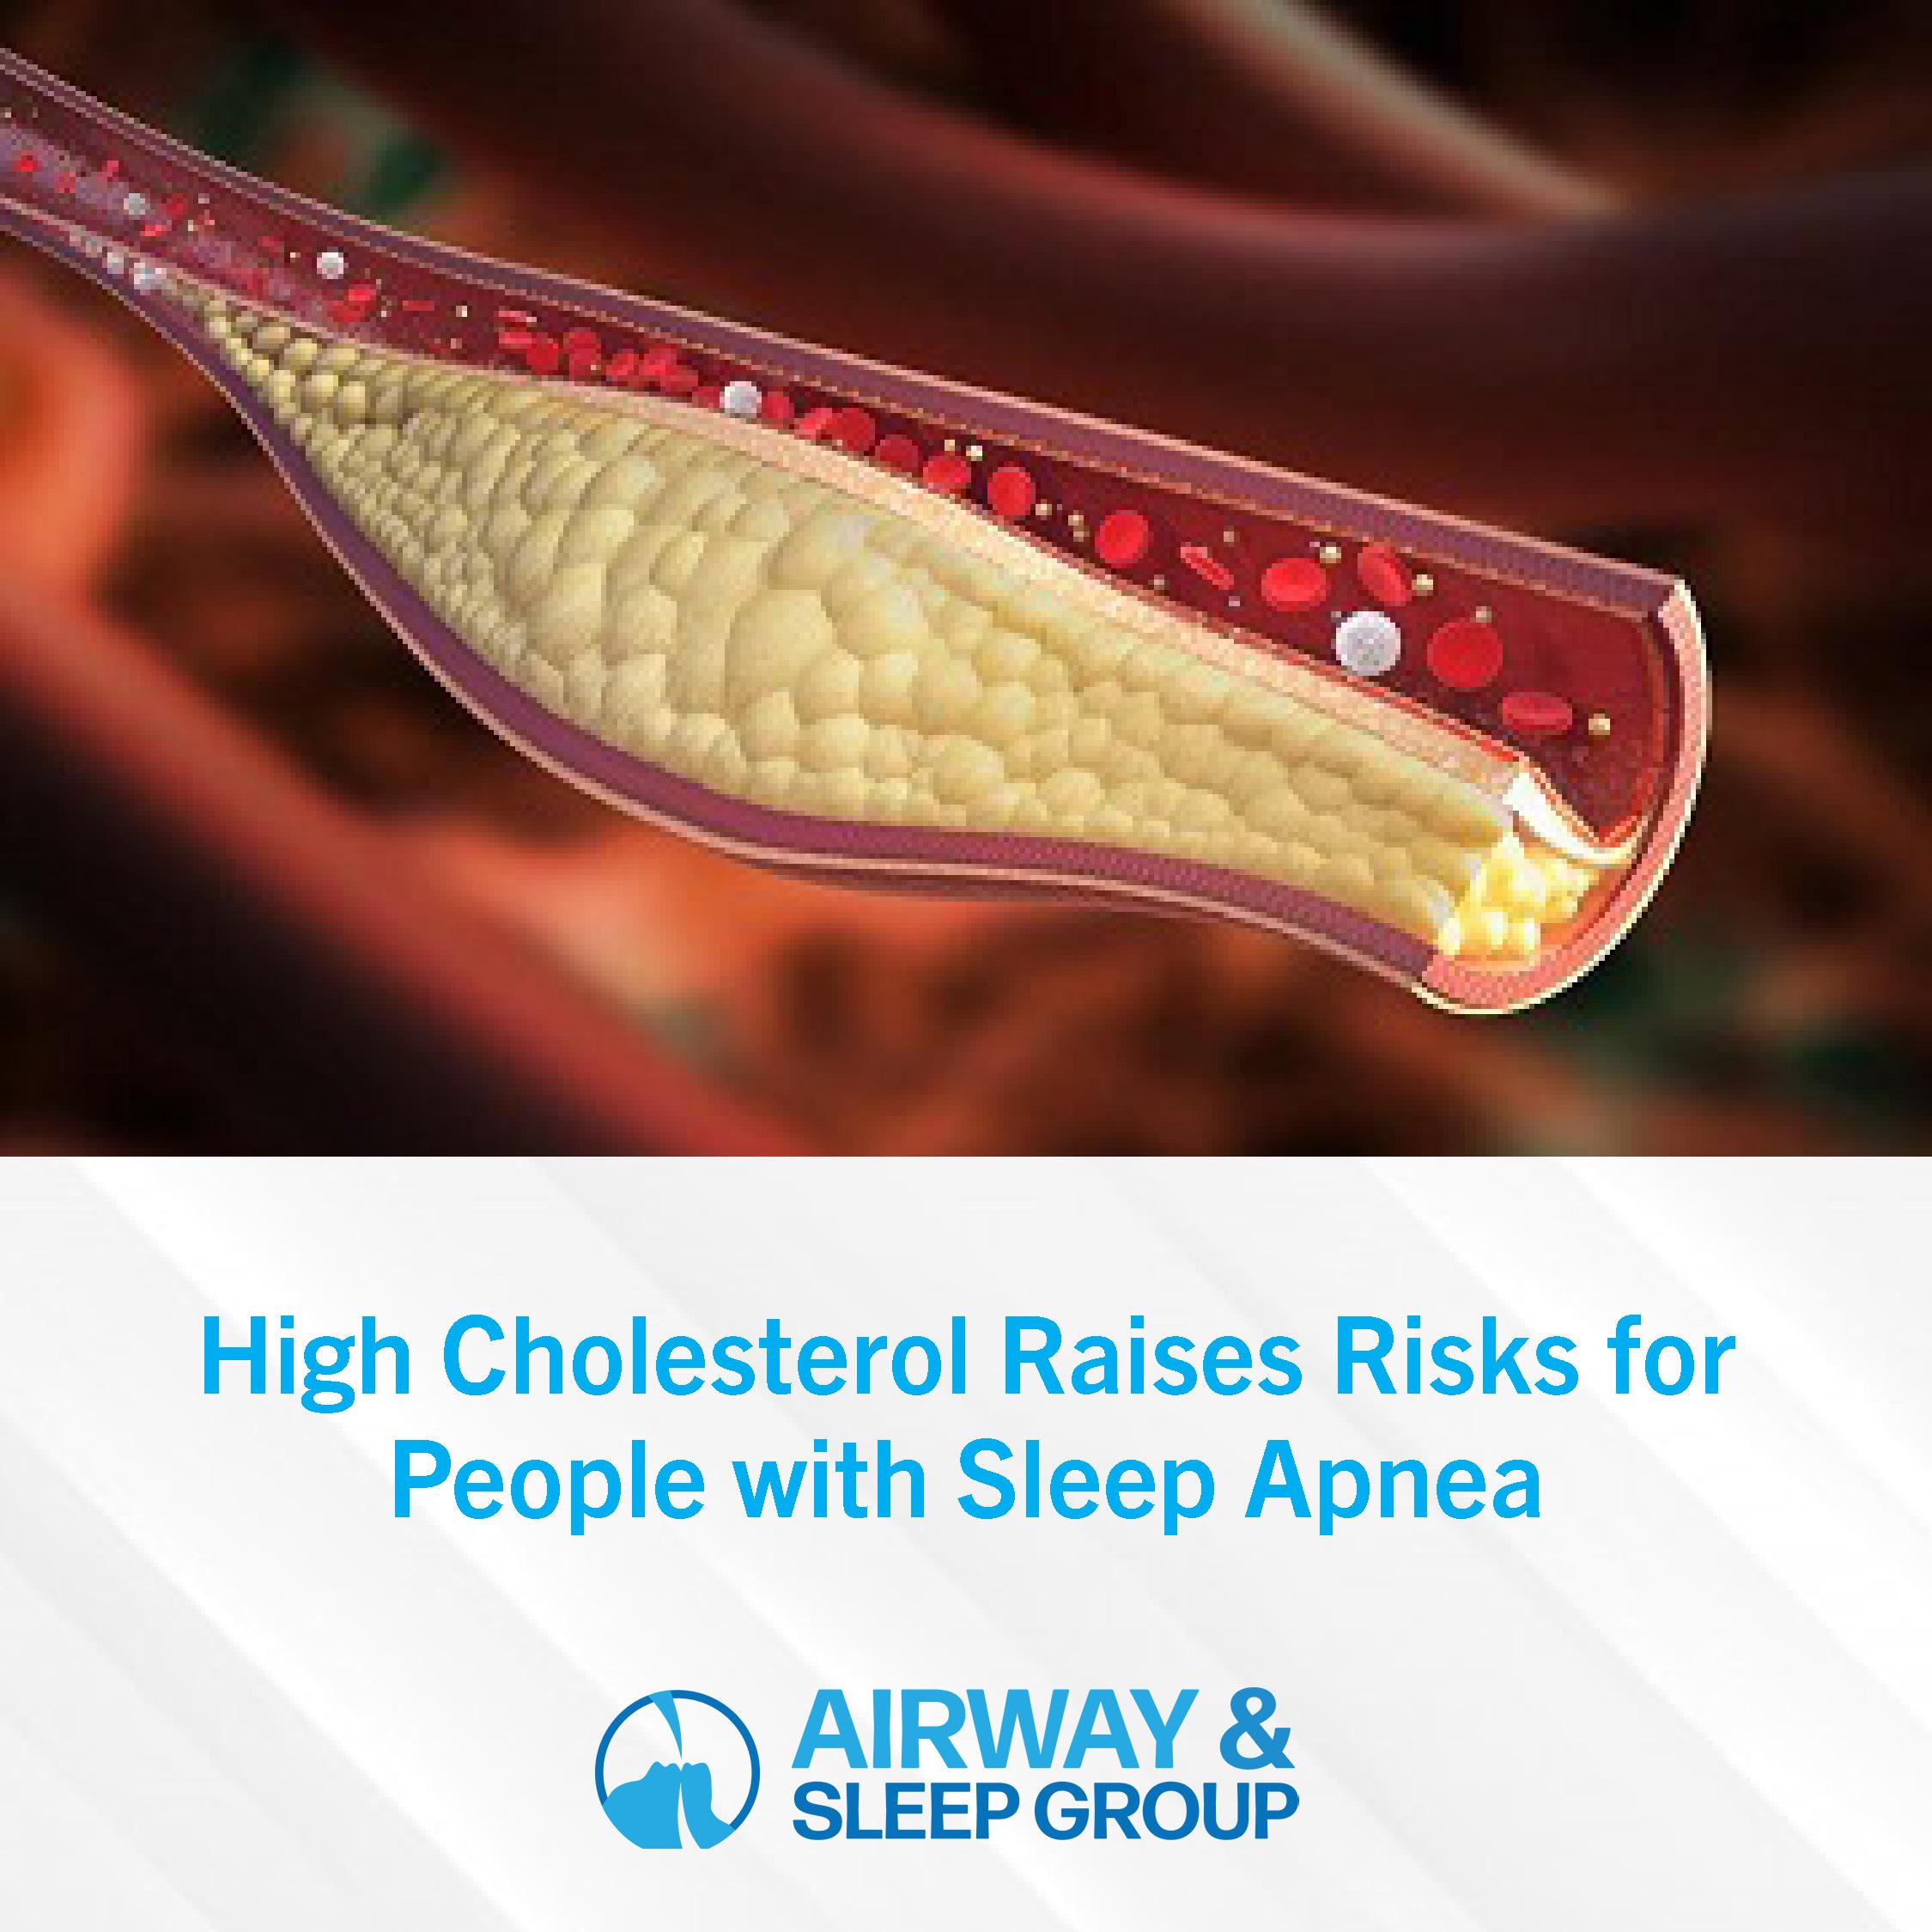 High Cholesterol Raises Risks for People with Sleep Apnea